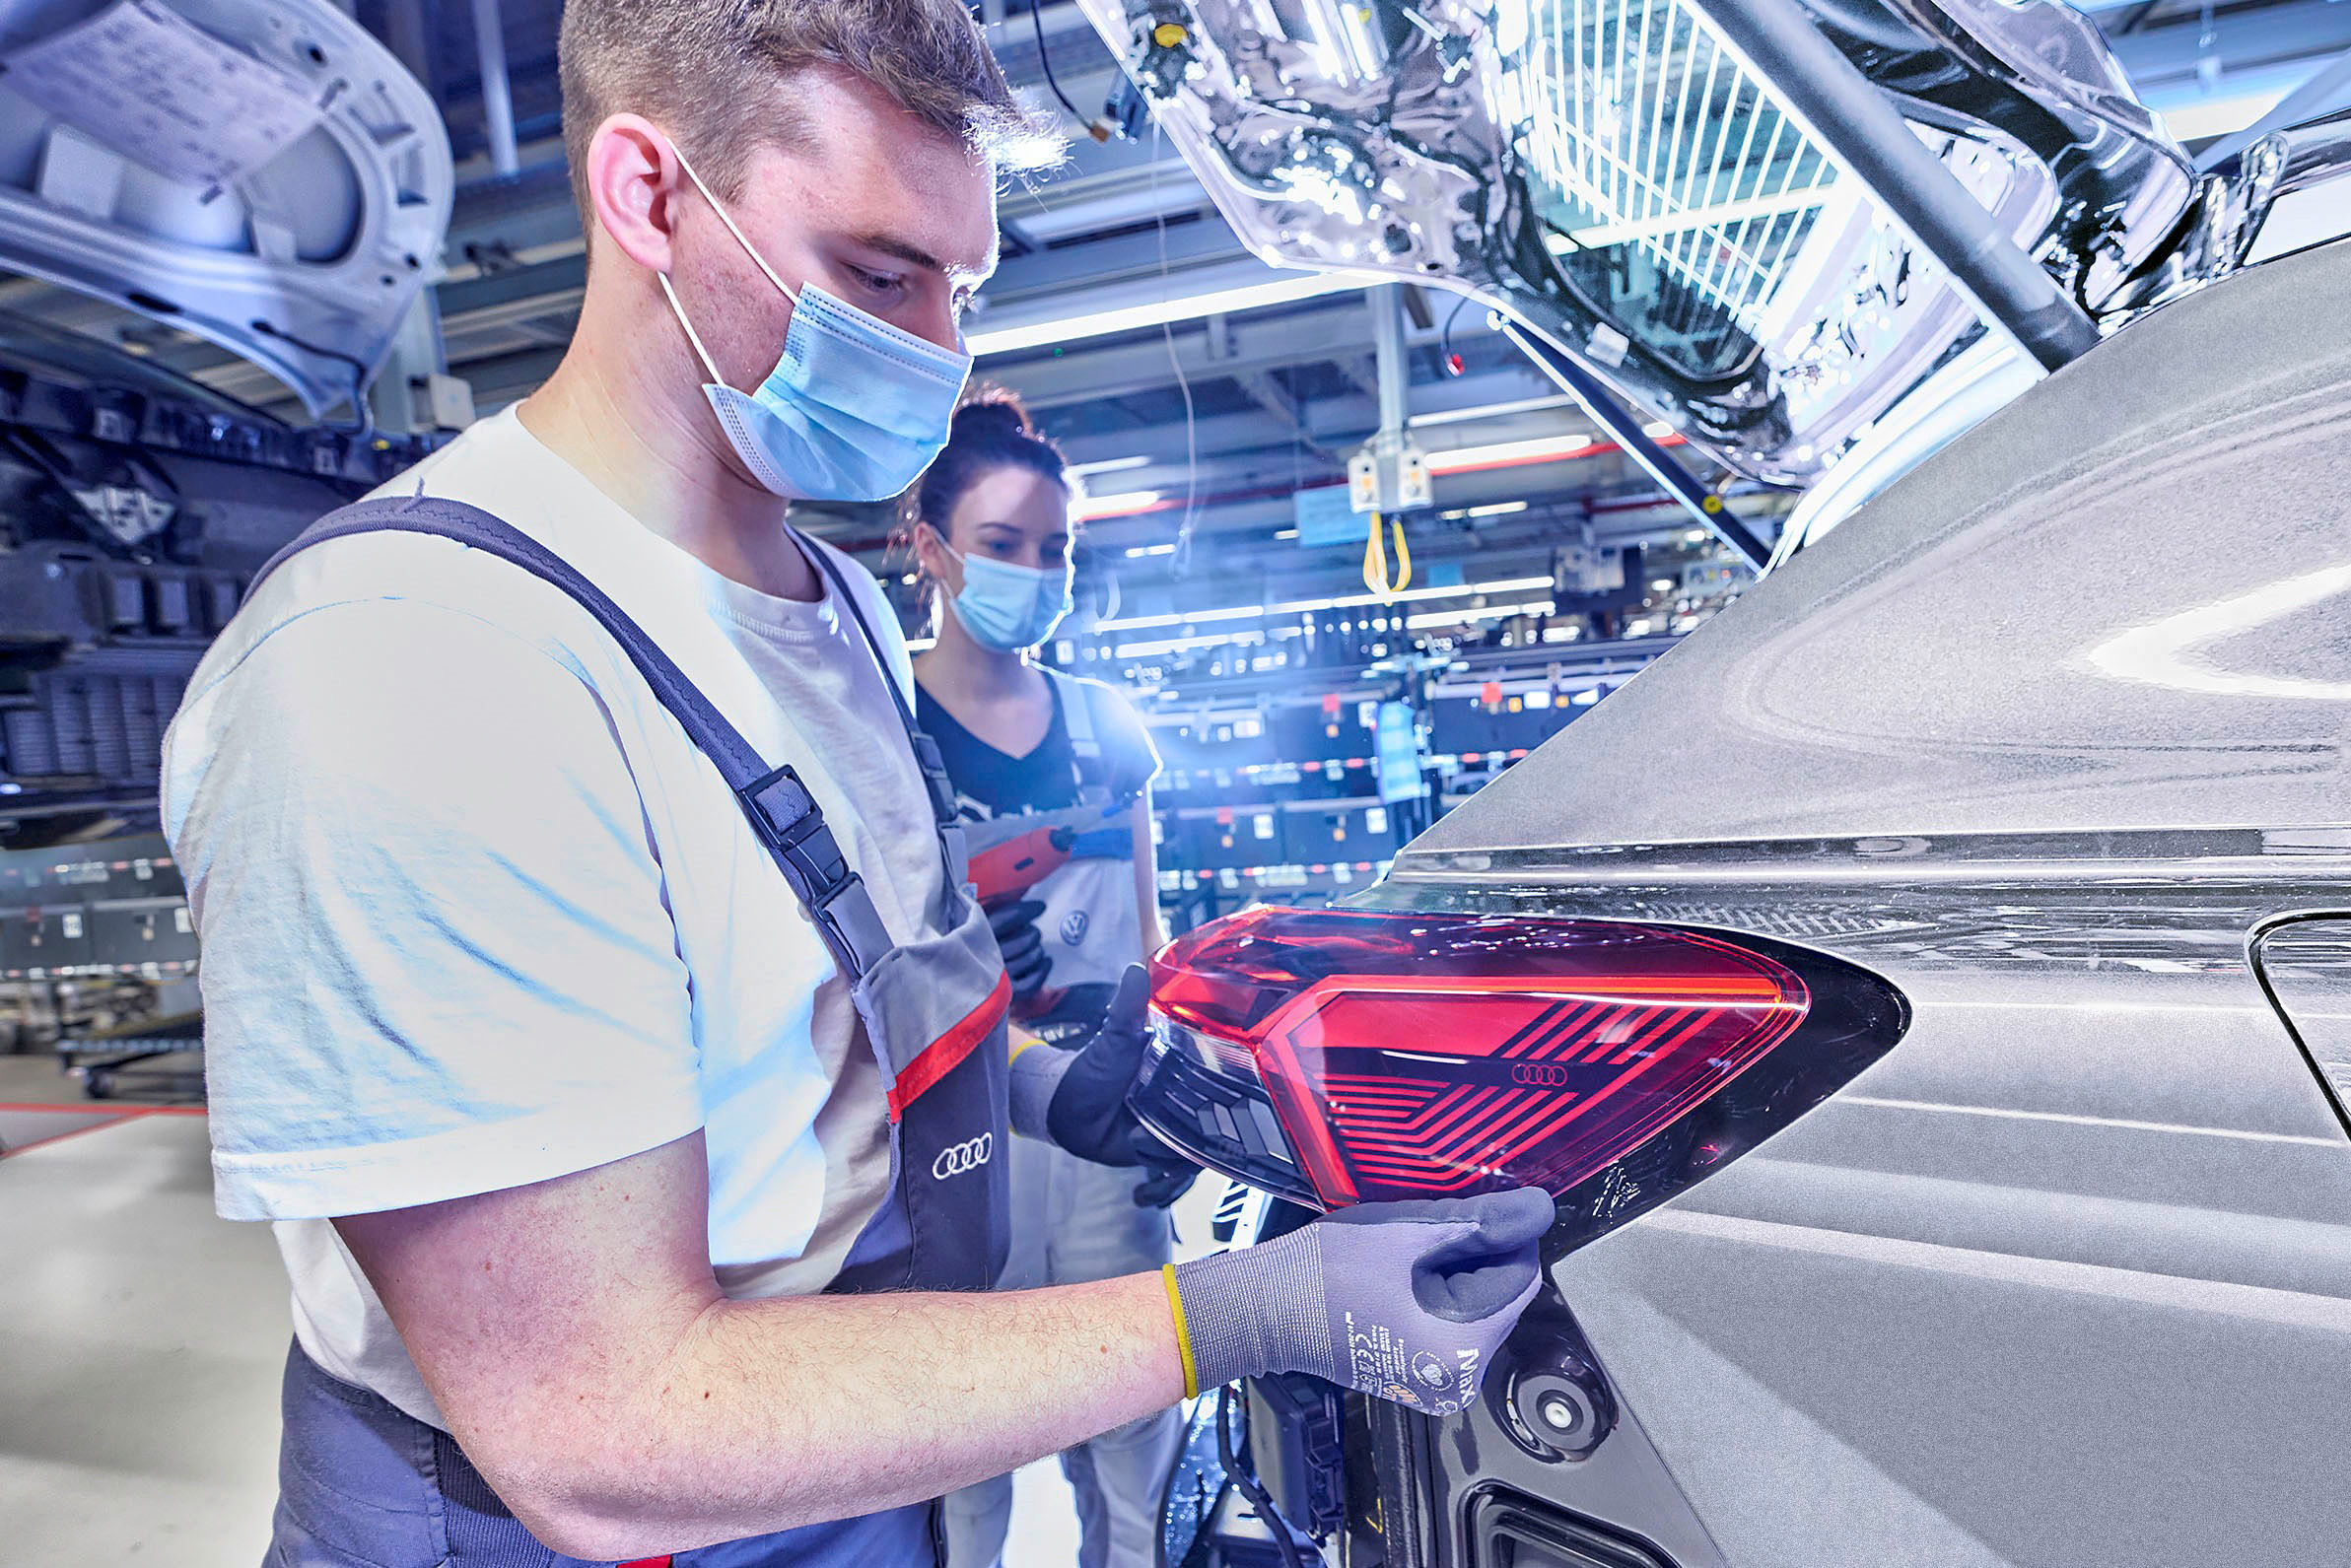 Start of production for Audi Q4 e-tron - Image 2